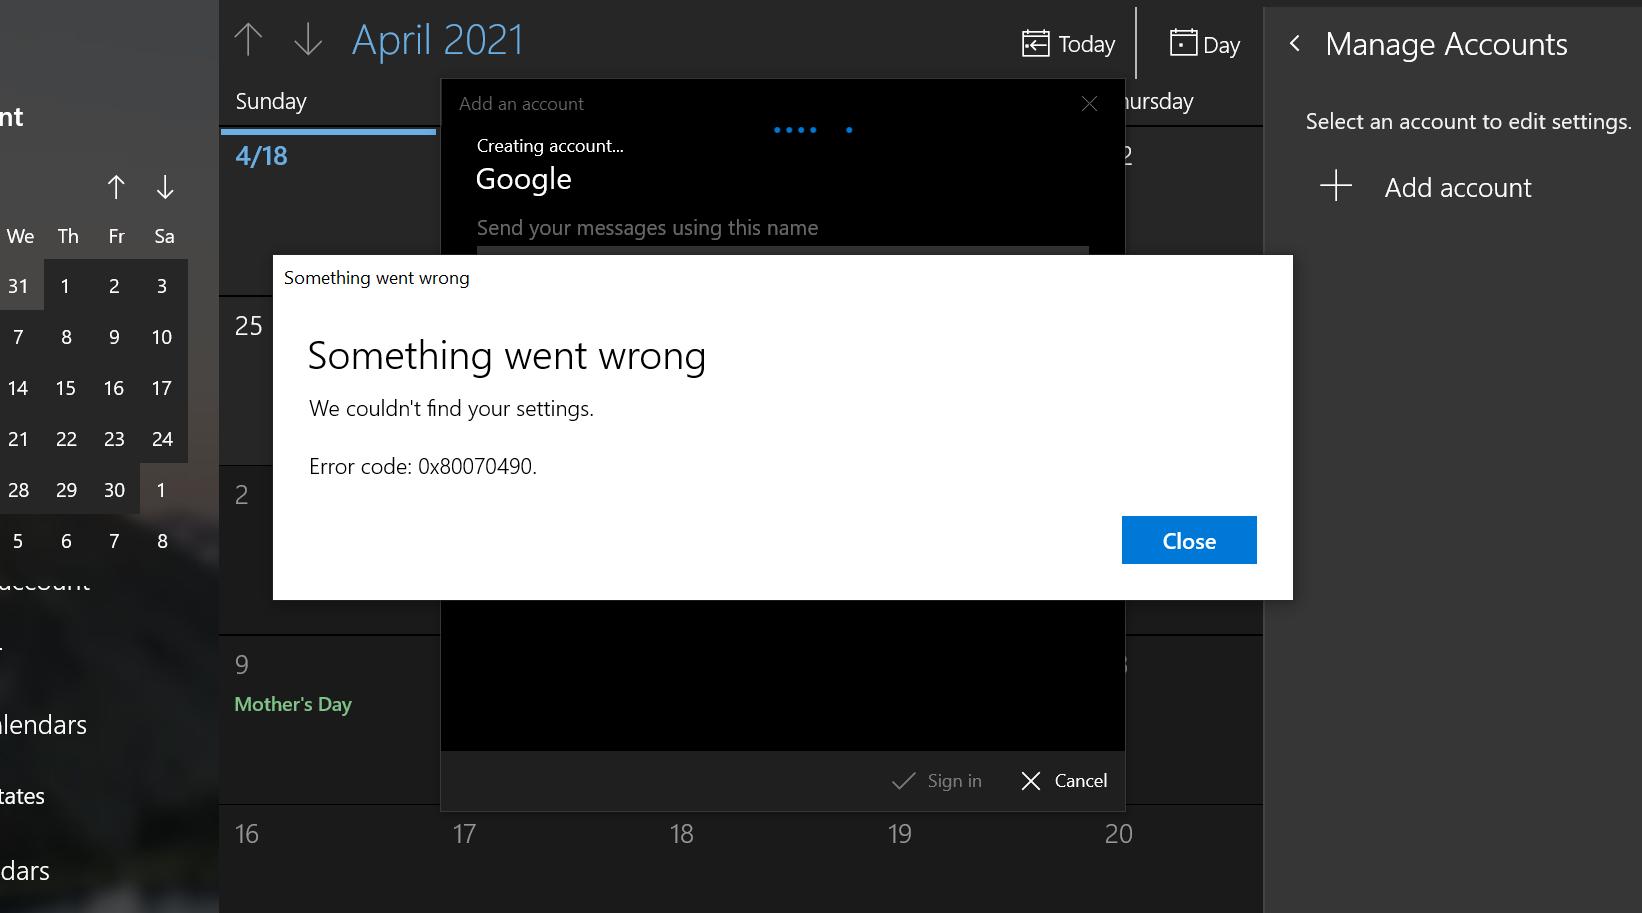 Unable to Connect Google Calendar to Windows 10 Calendar. Error code: 0x80070490 8396597b-6a0f-4e70-be63-91c34b80954c?upload=true.png